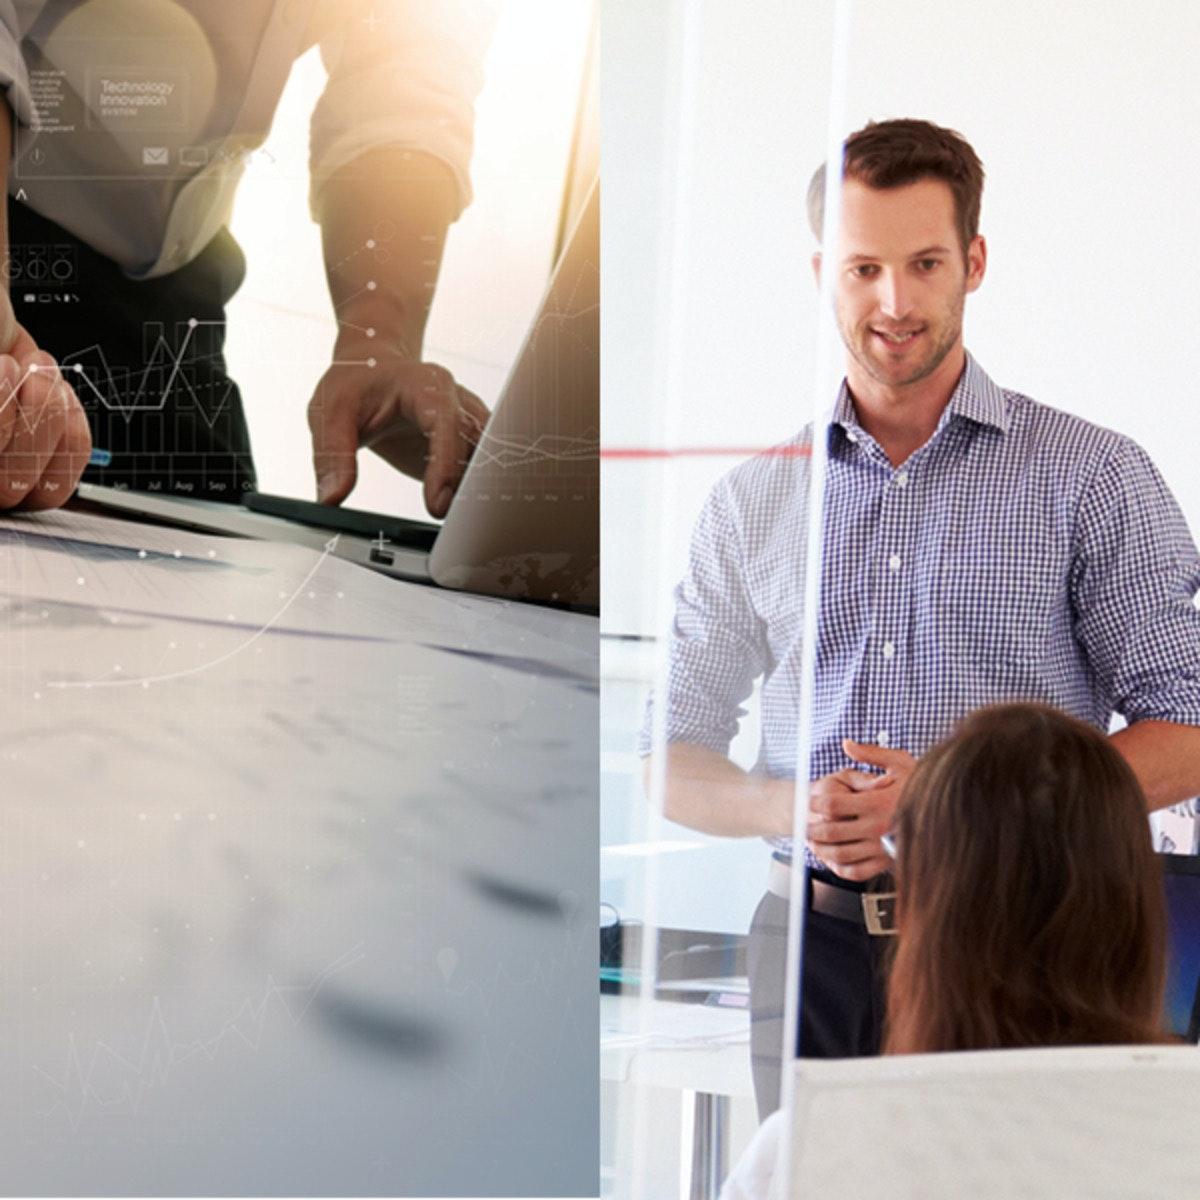 Interpersonal Communication for Engineering Leaders